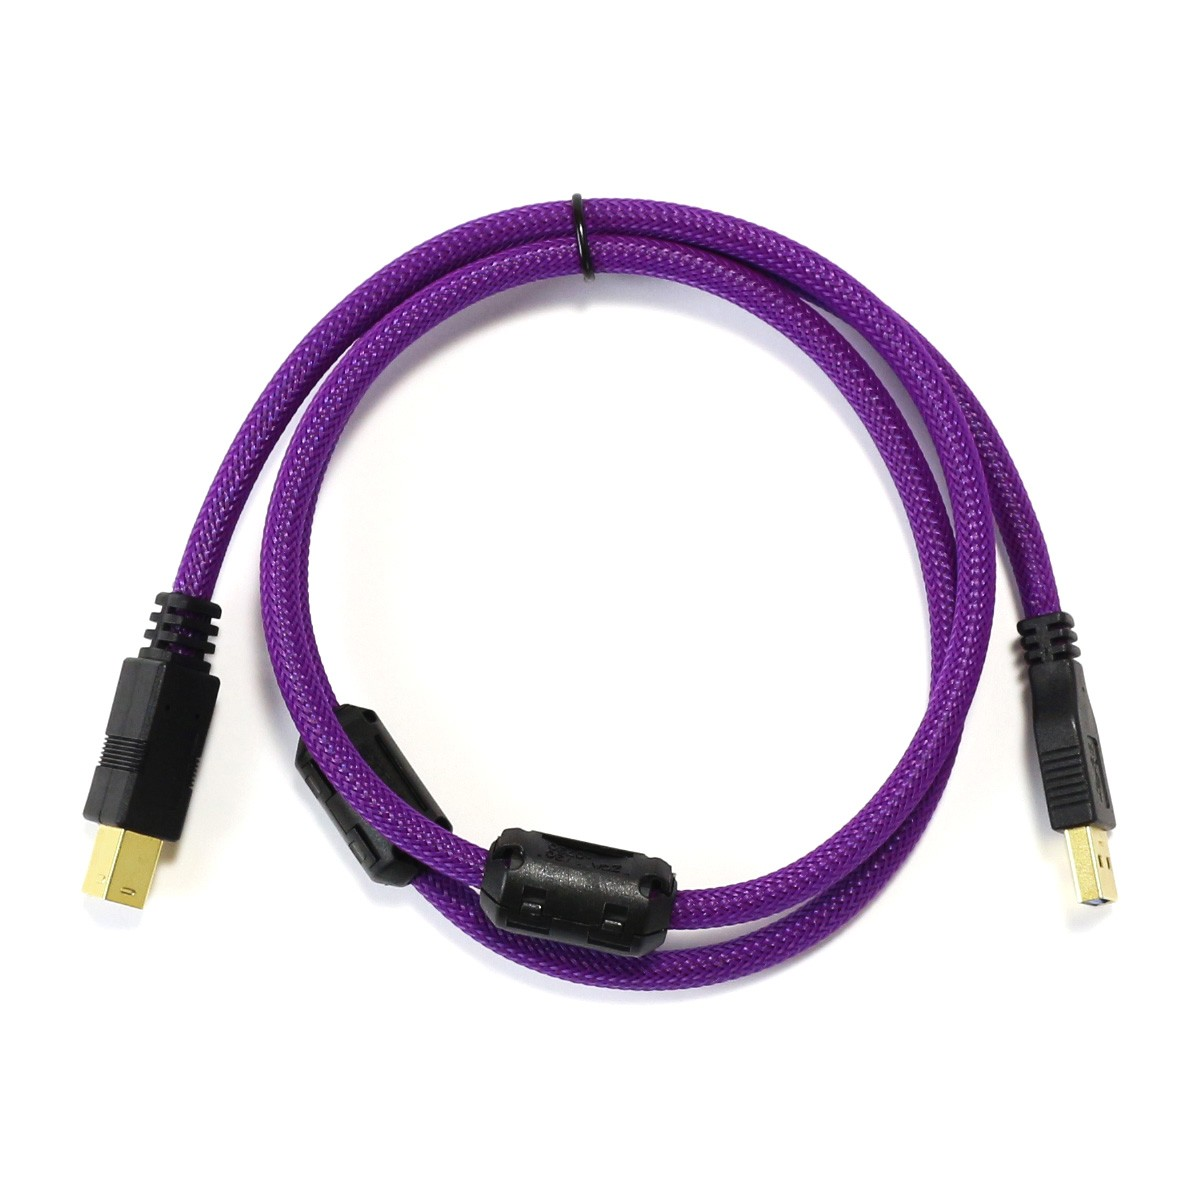 Câble USB-A Mâle vers USB-B superspeed Mâle 3.0 Cuivre 2m